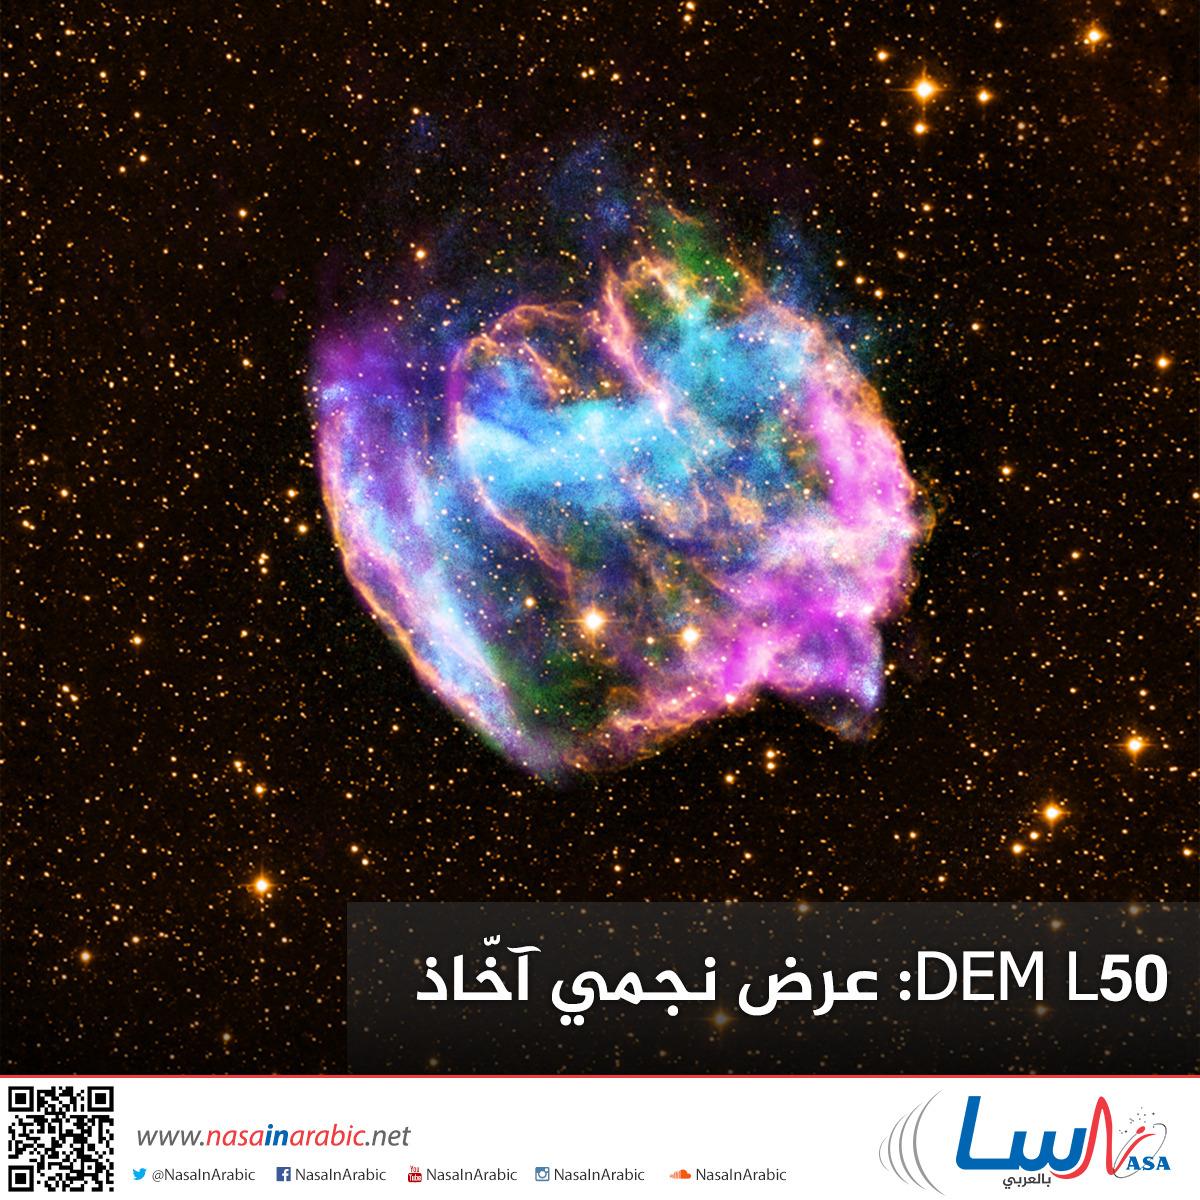 DEM L50: عرض نجمي آخّاذ